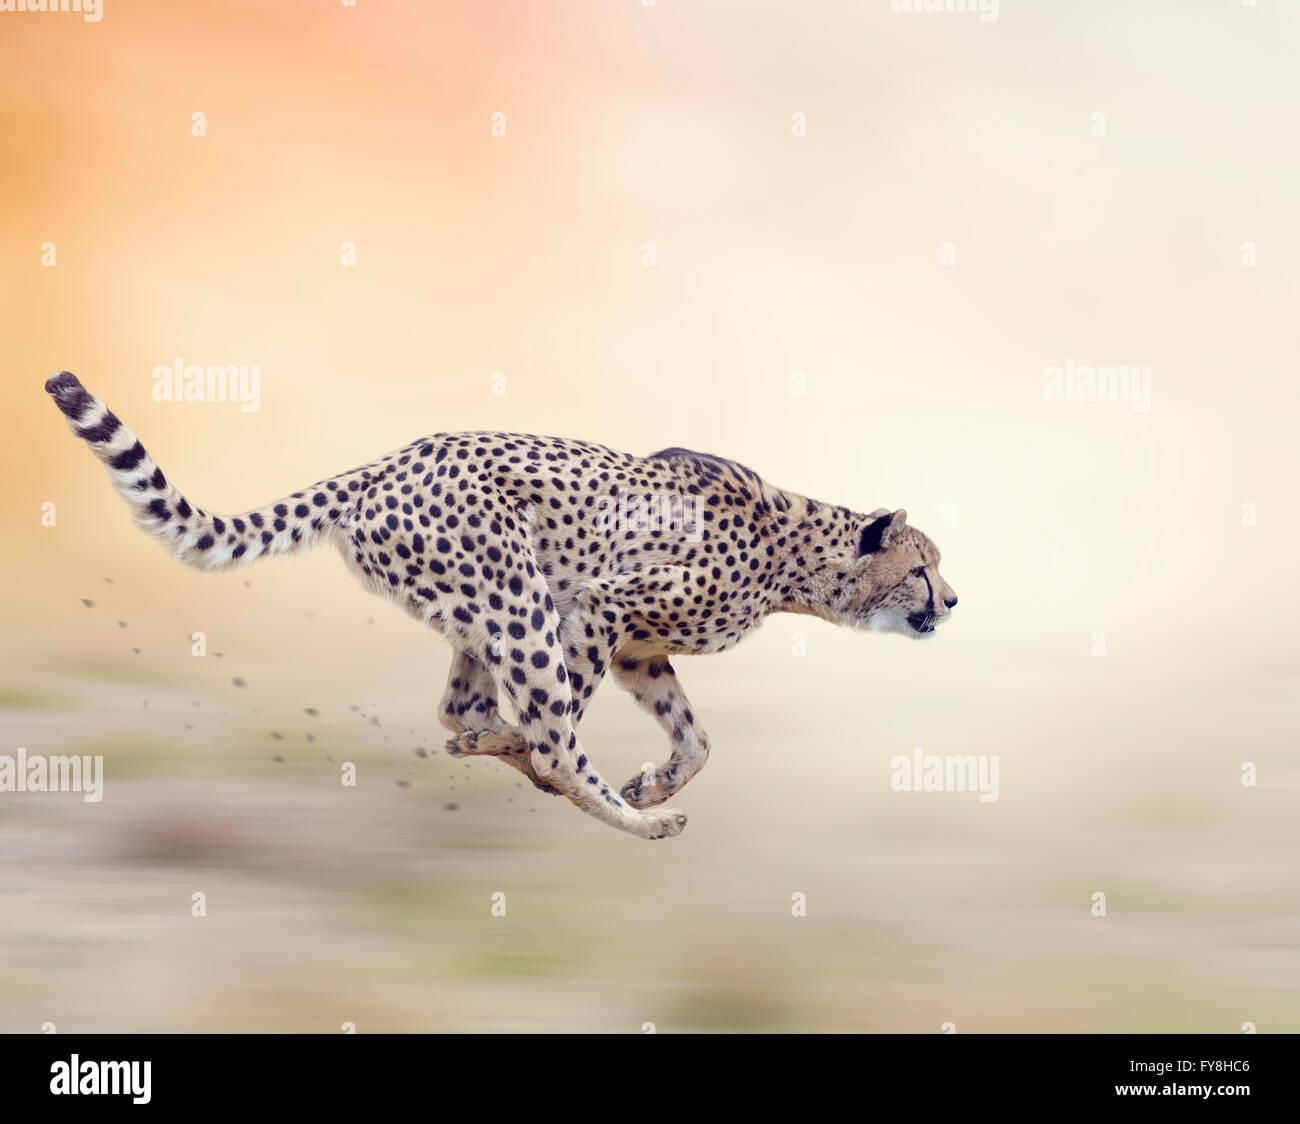 Cheetah  Running on Soft Focus Background - Stock Image